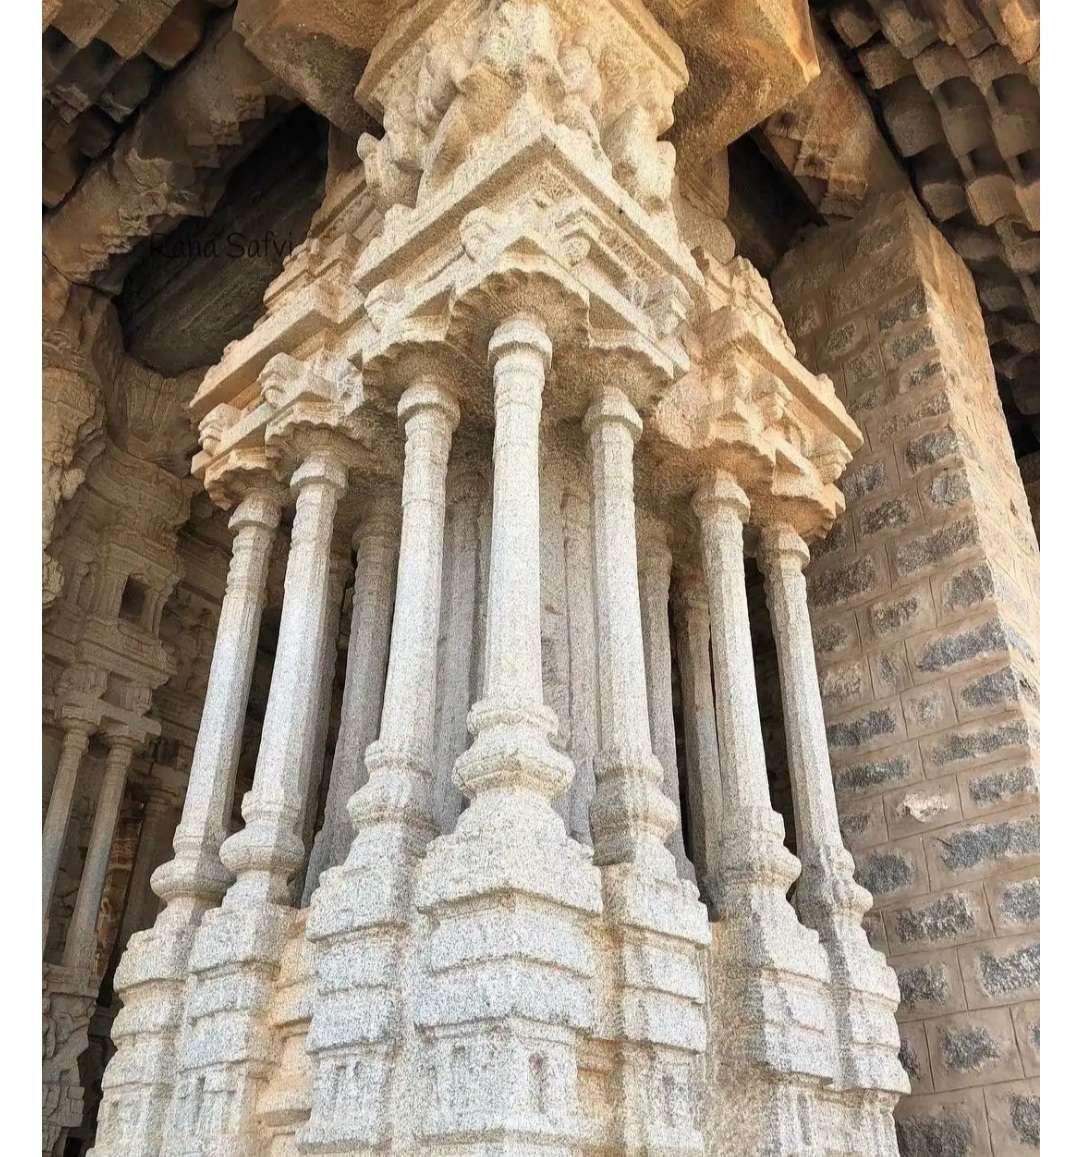 Hindu mandiron ke rochak tathy